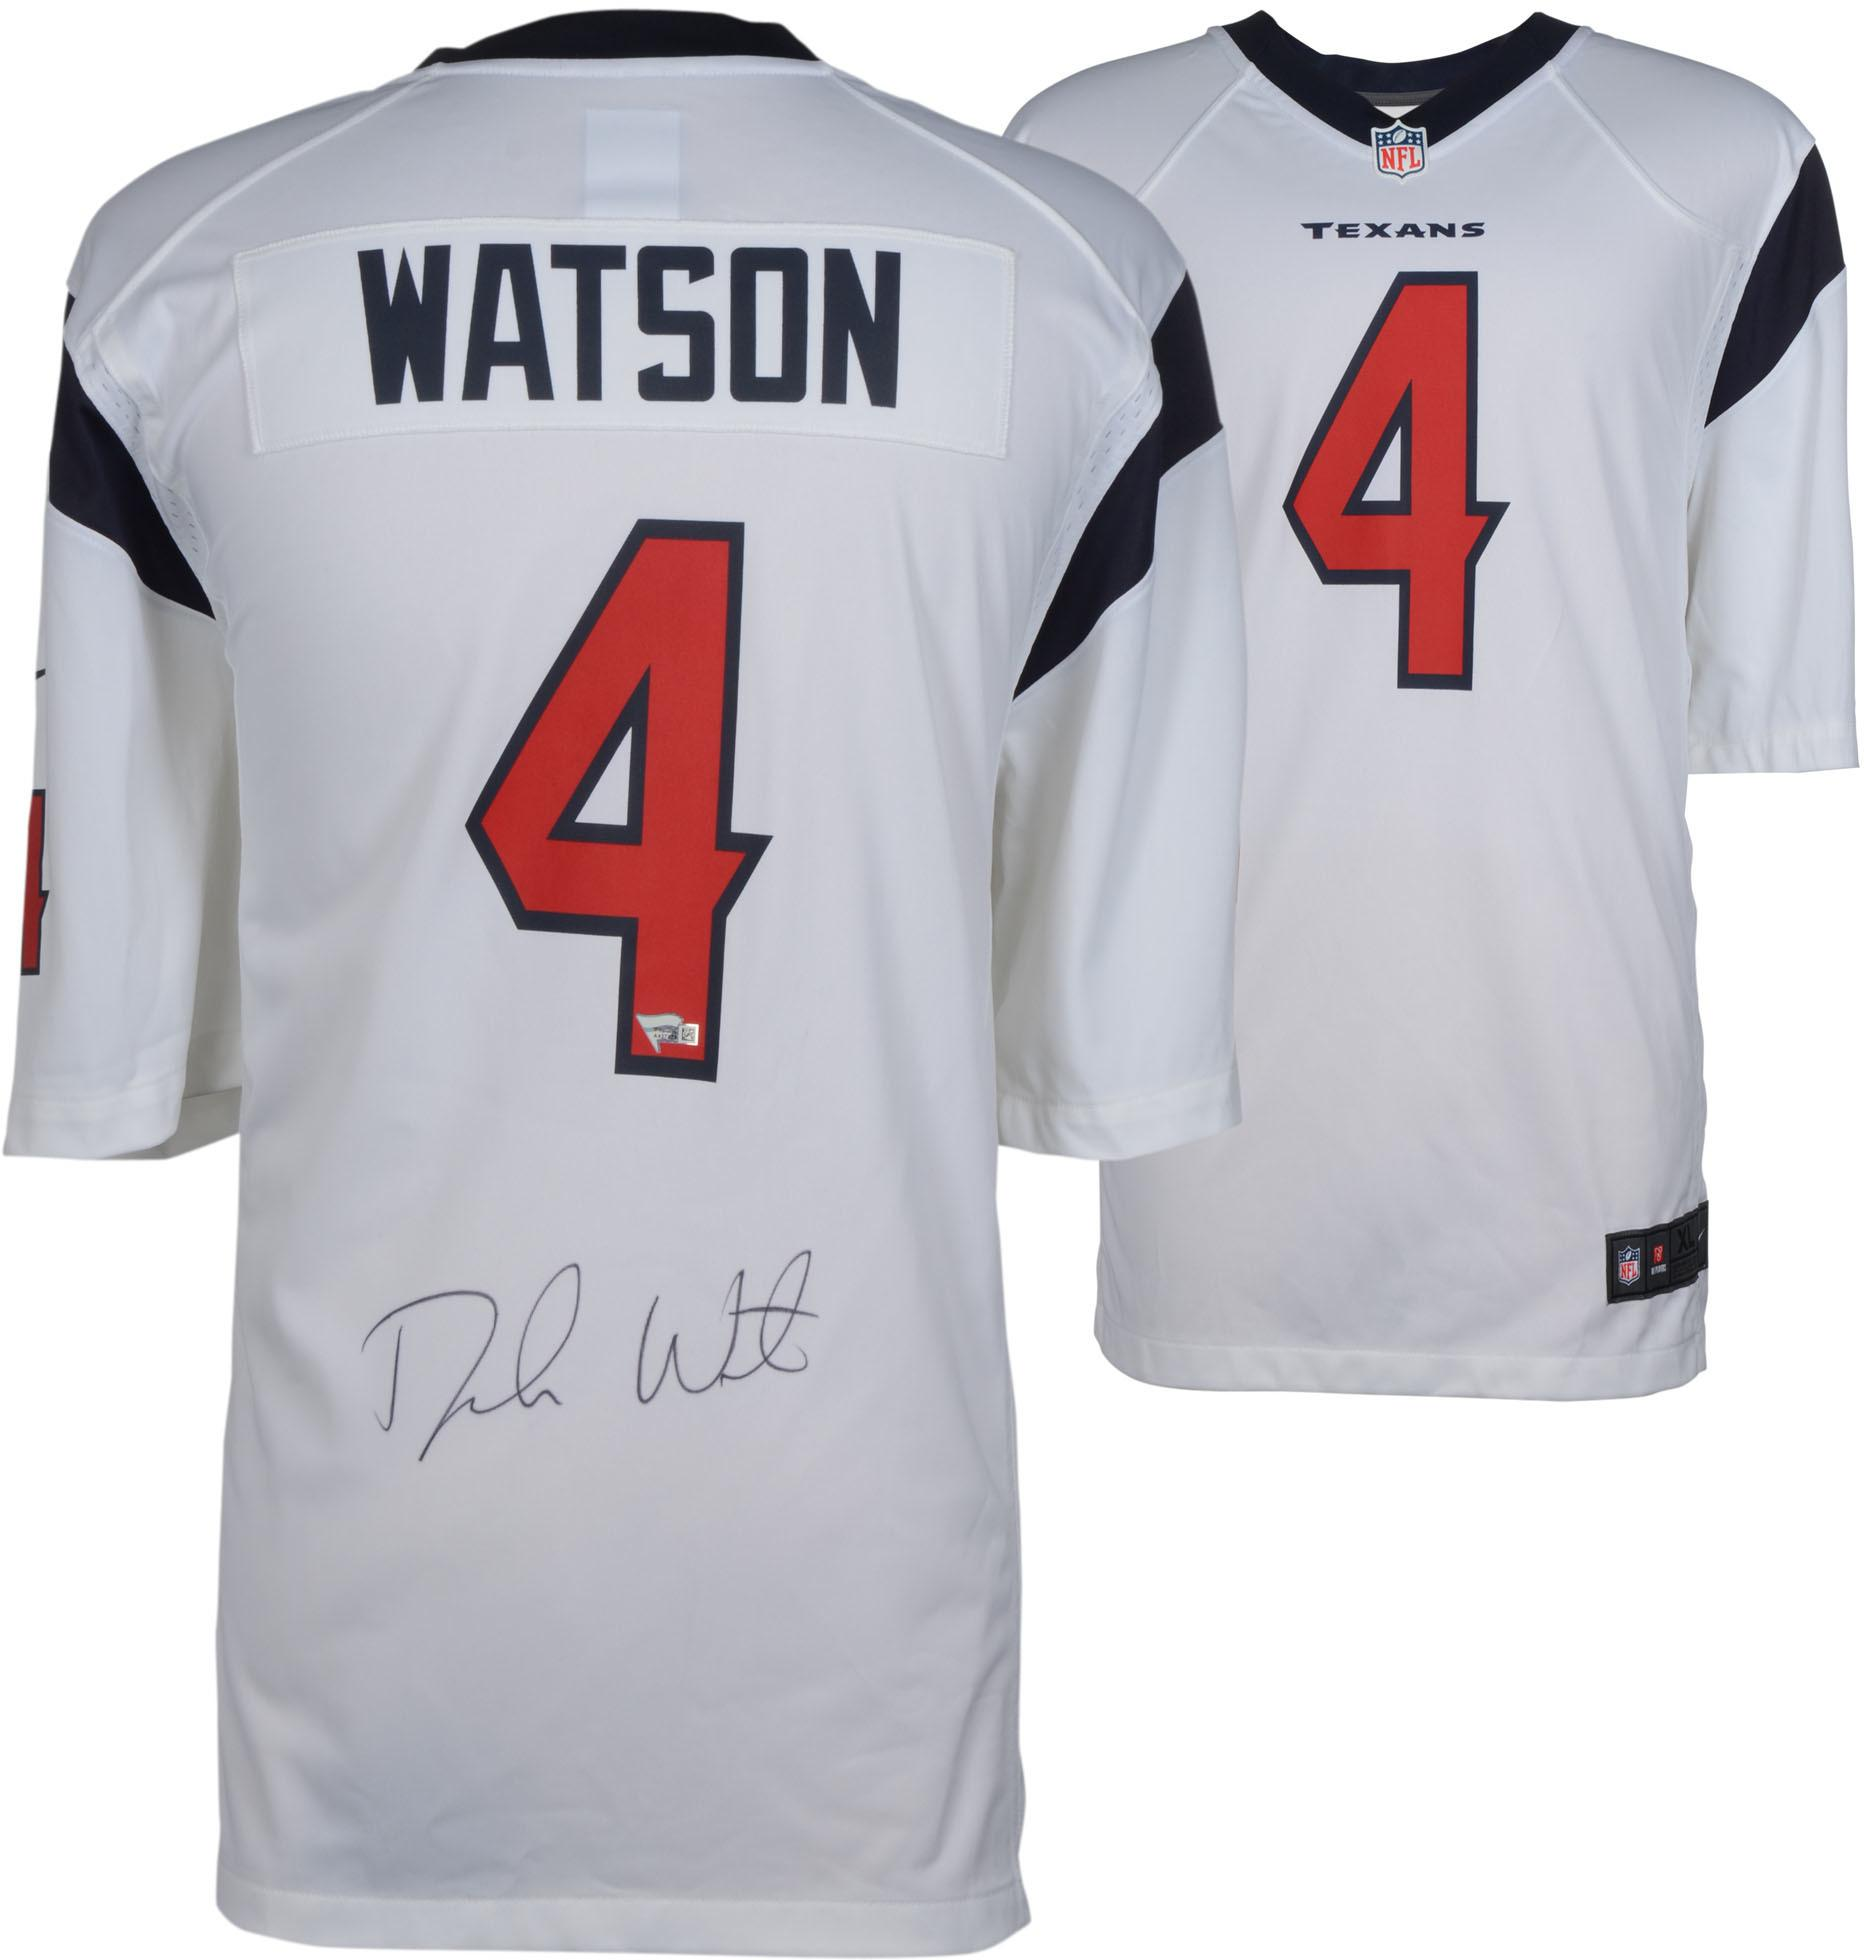 Deshaun Watson Houston Texans Autographed White Game Jersey - Fanatics Authentic Certified - Walmart.com